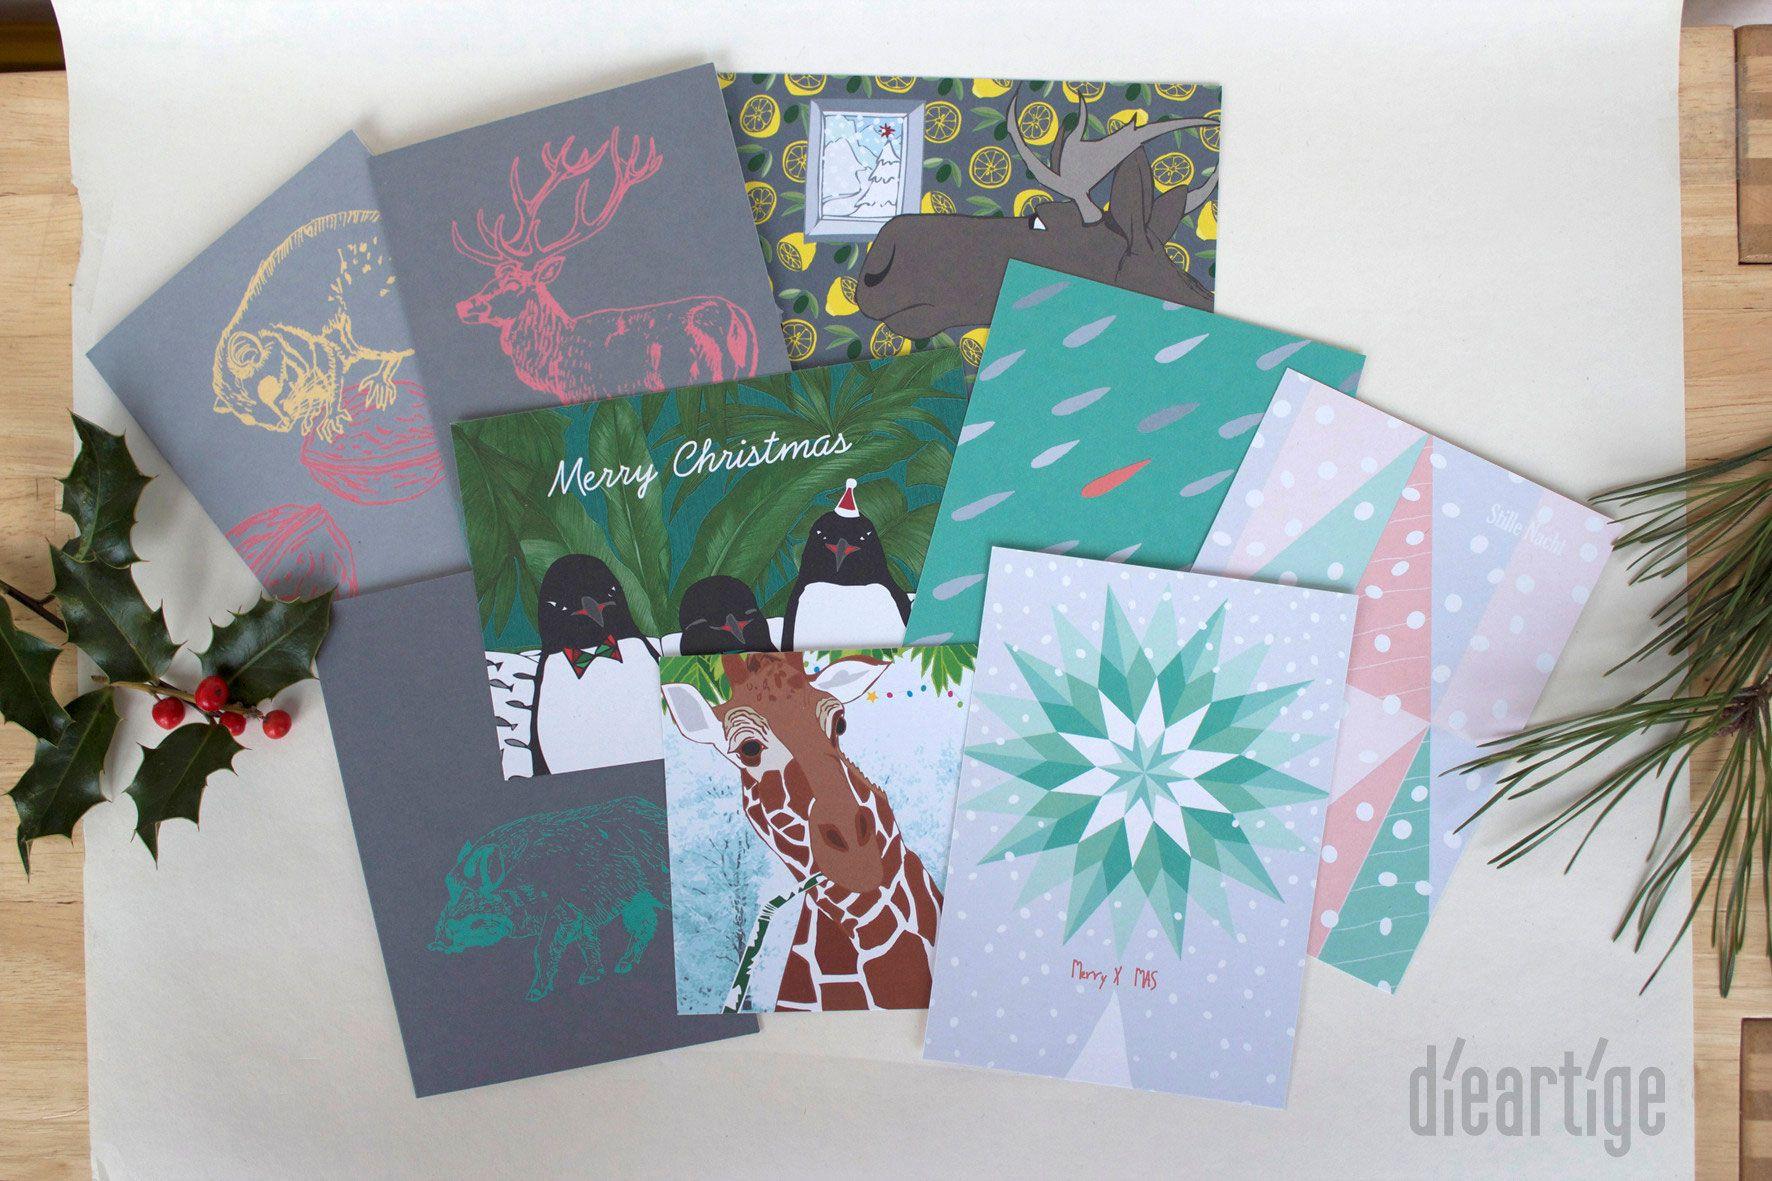 dieartigeBLOG - dieartige Kartenedition 2015 // Cards from 2015